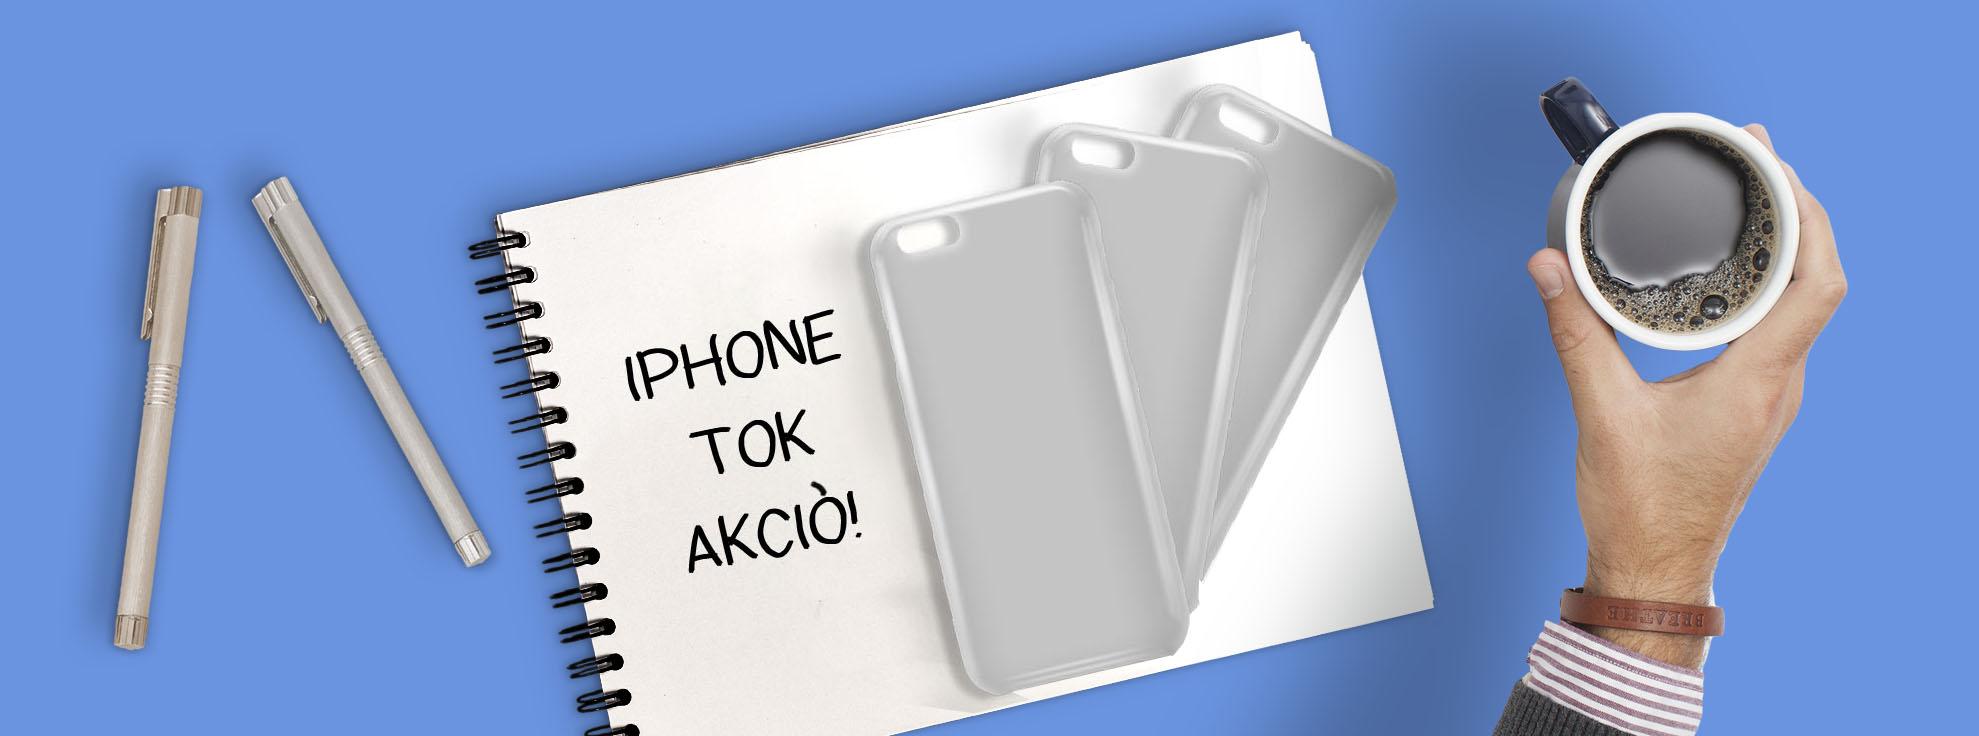 IPHONE TOK AKCIÓ!